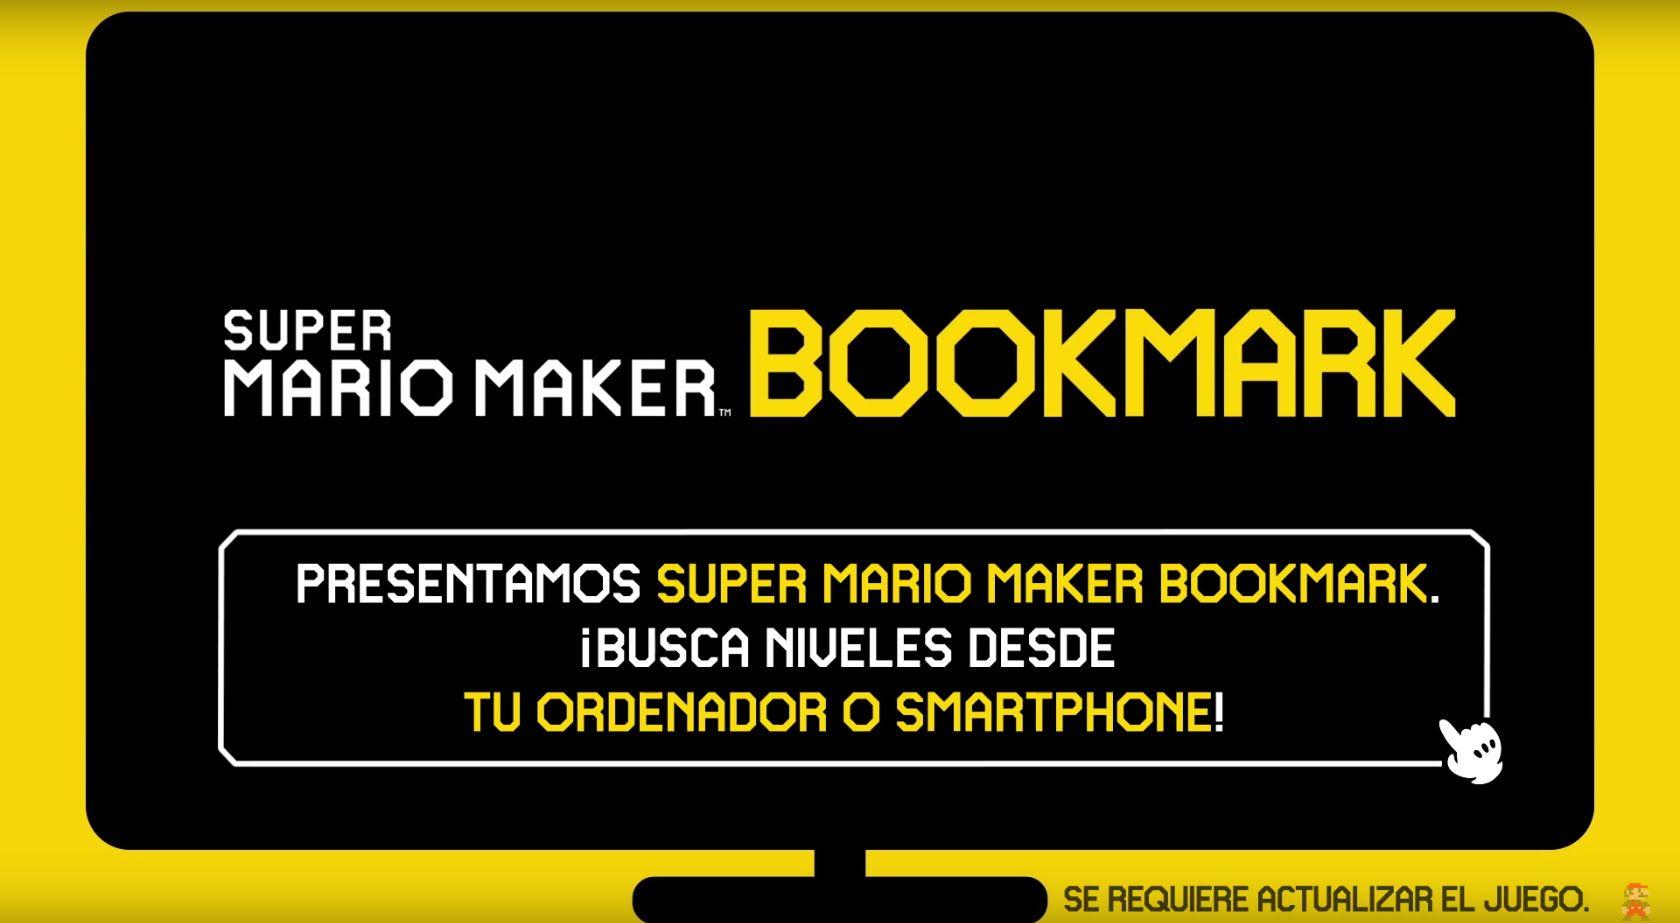 super_mario_maker_bookmark_arte